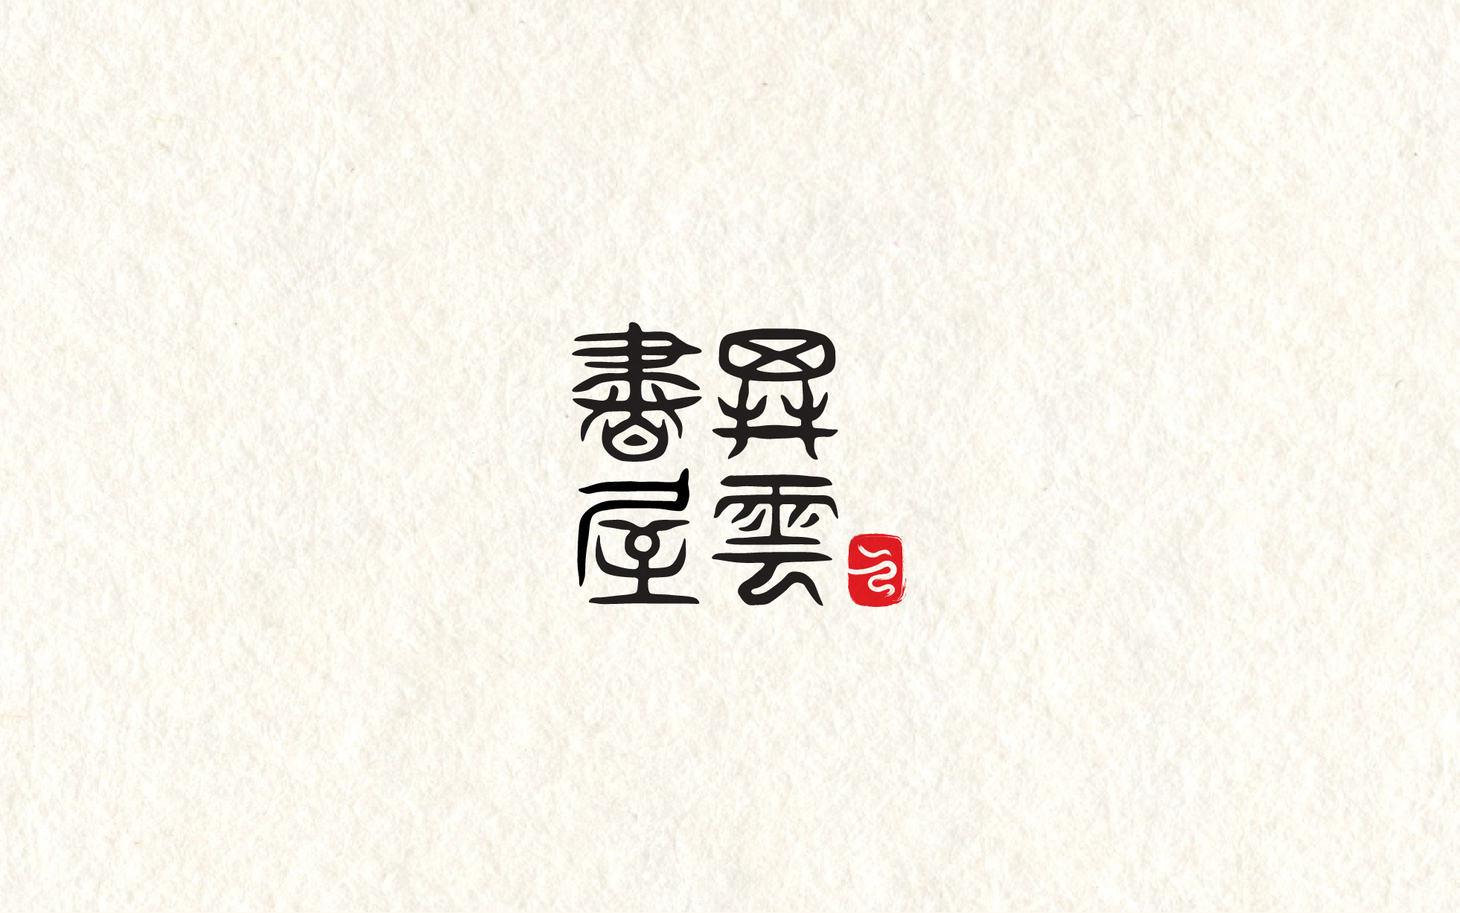 JST_異雲書屋_LOGO_20150210_2-04.jpg